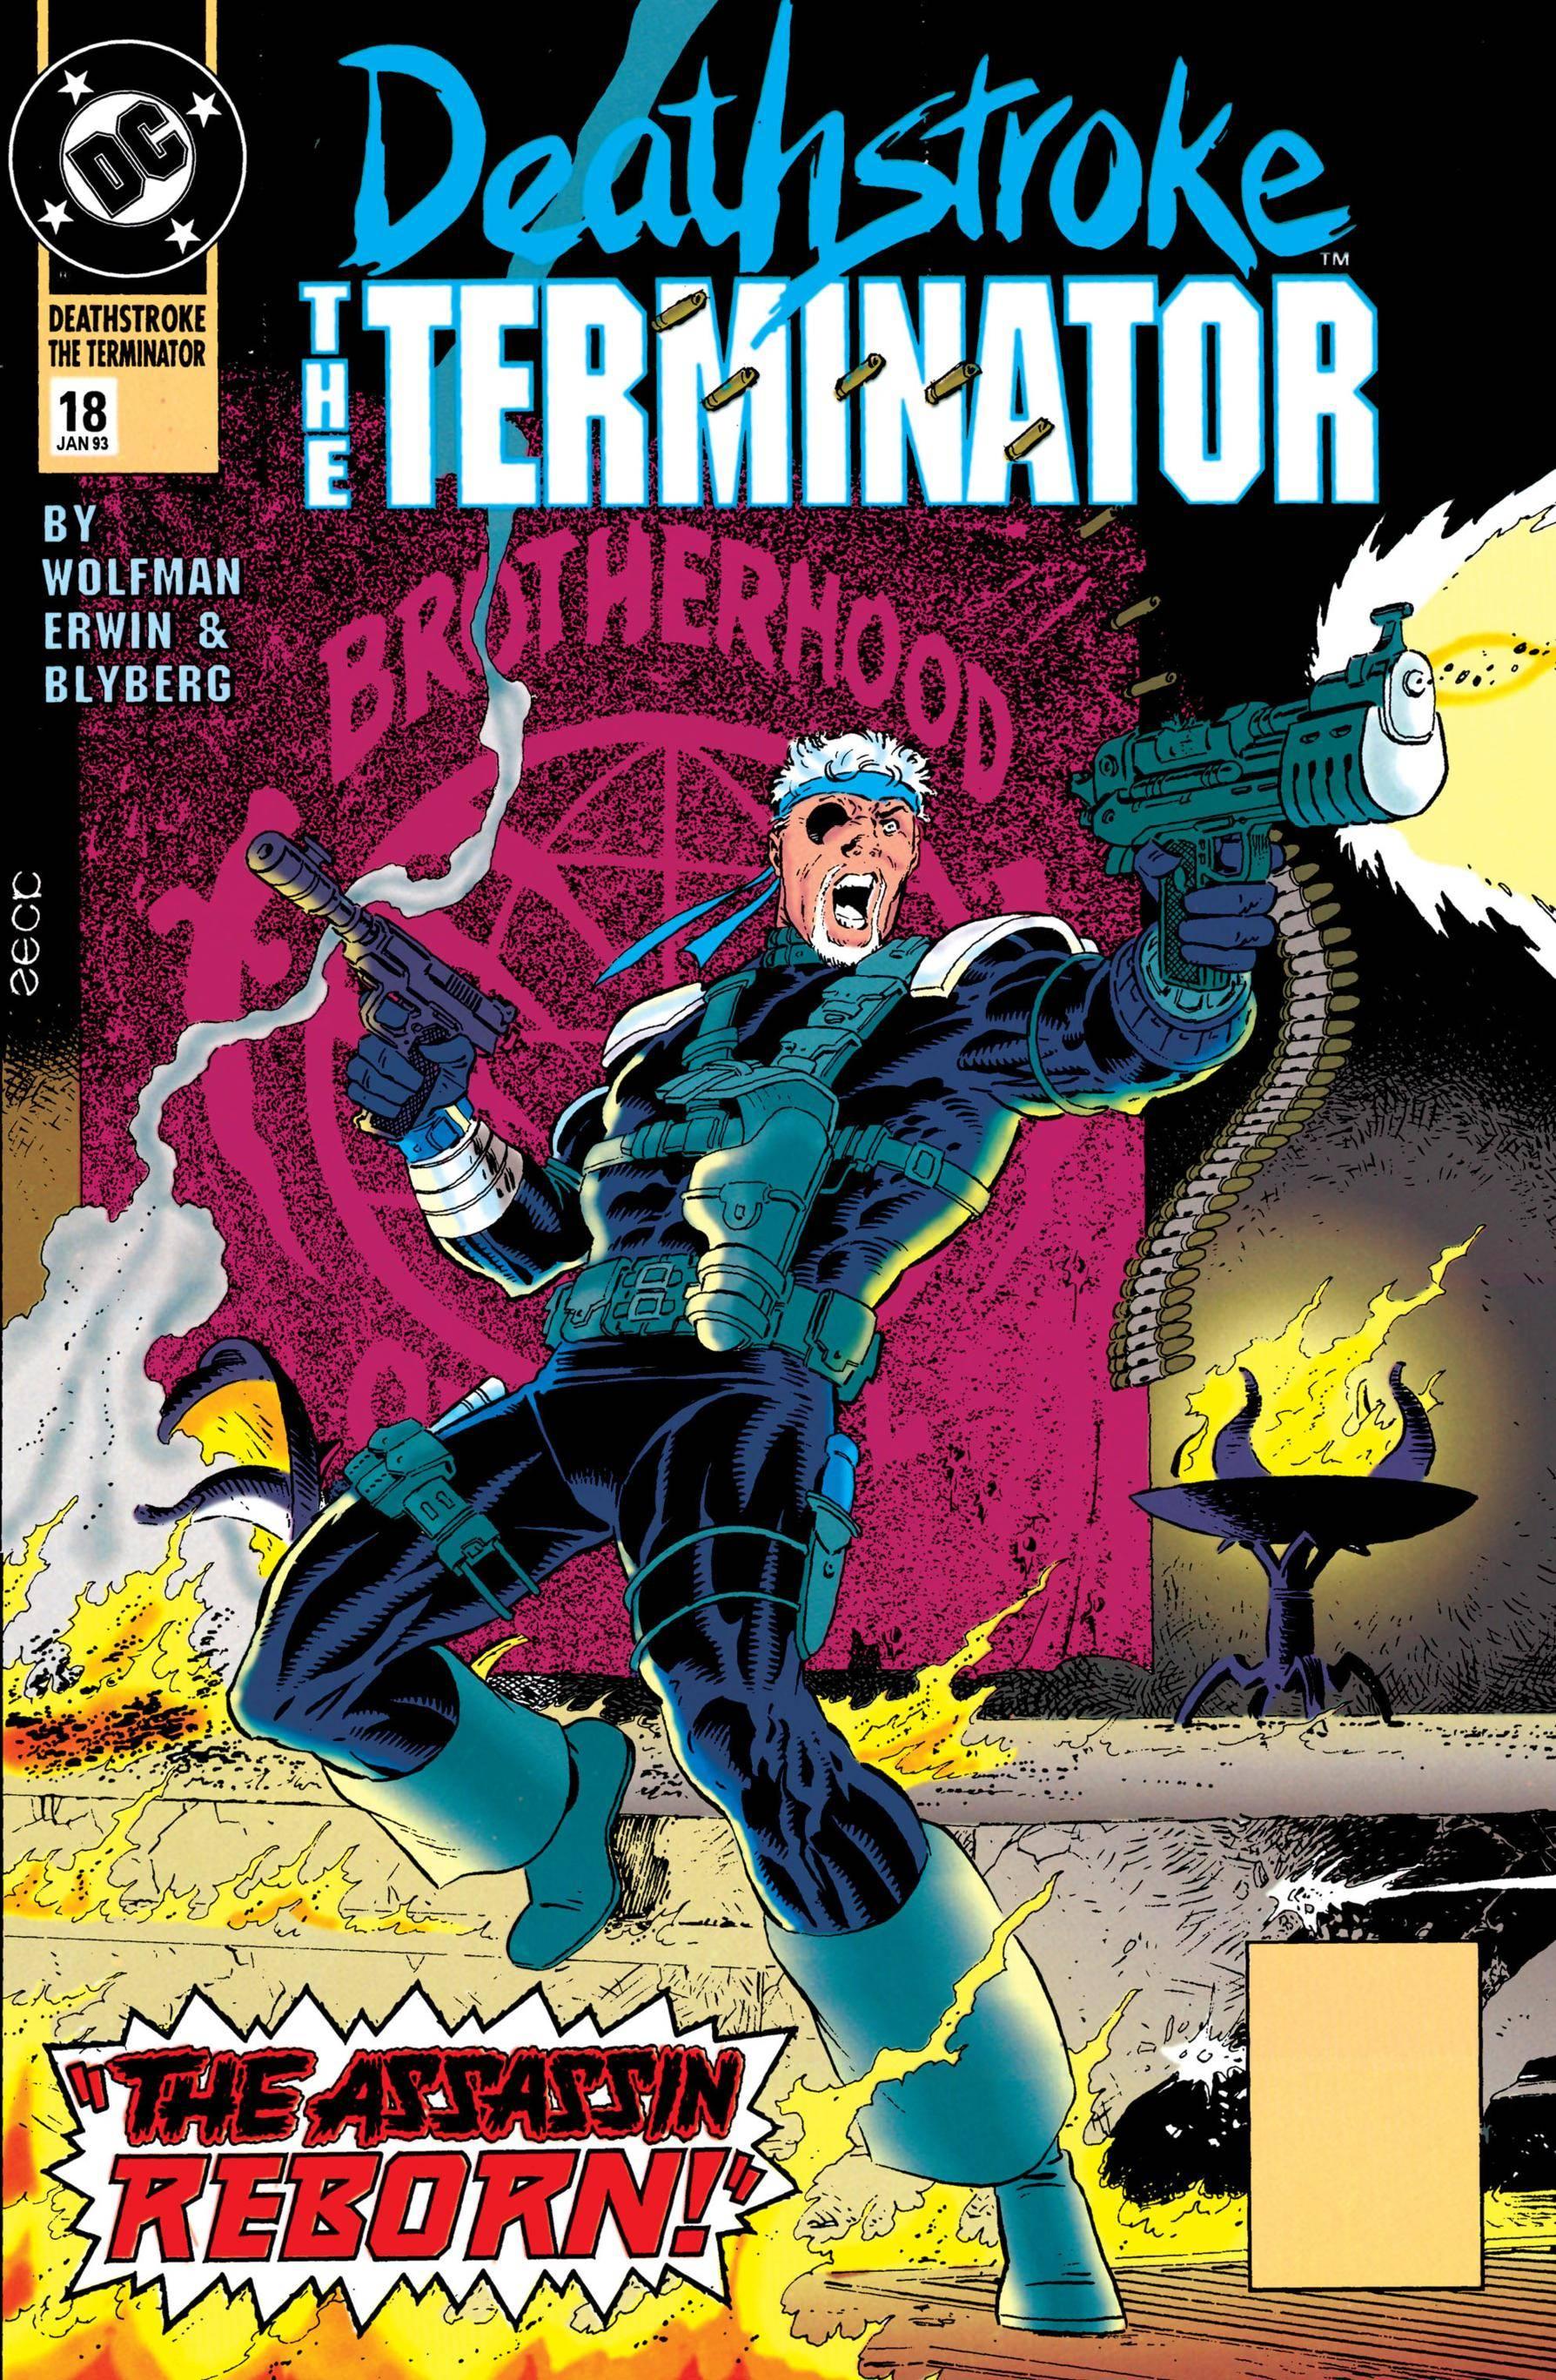 Deathstroke the Terminator 018 1993 digital Minutemen-Midas